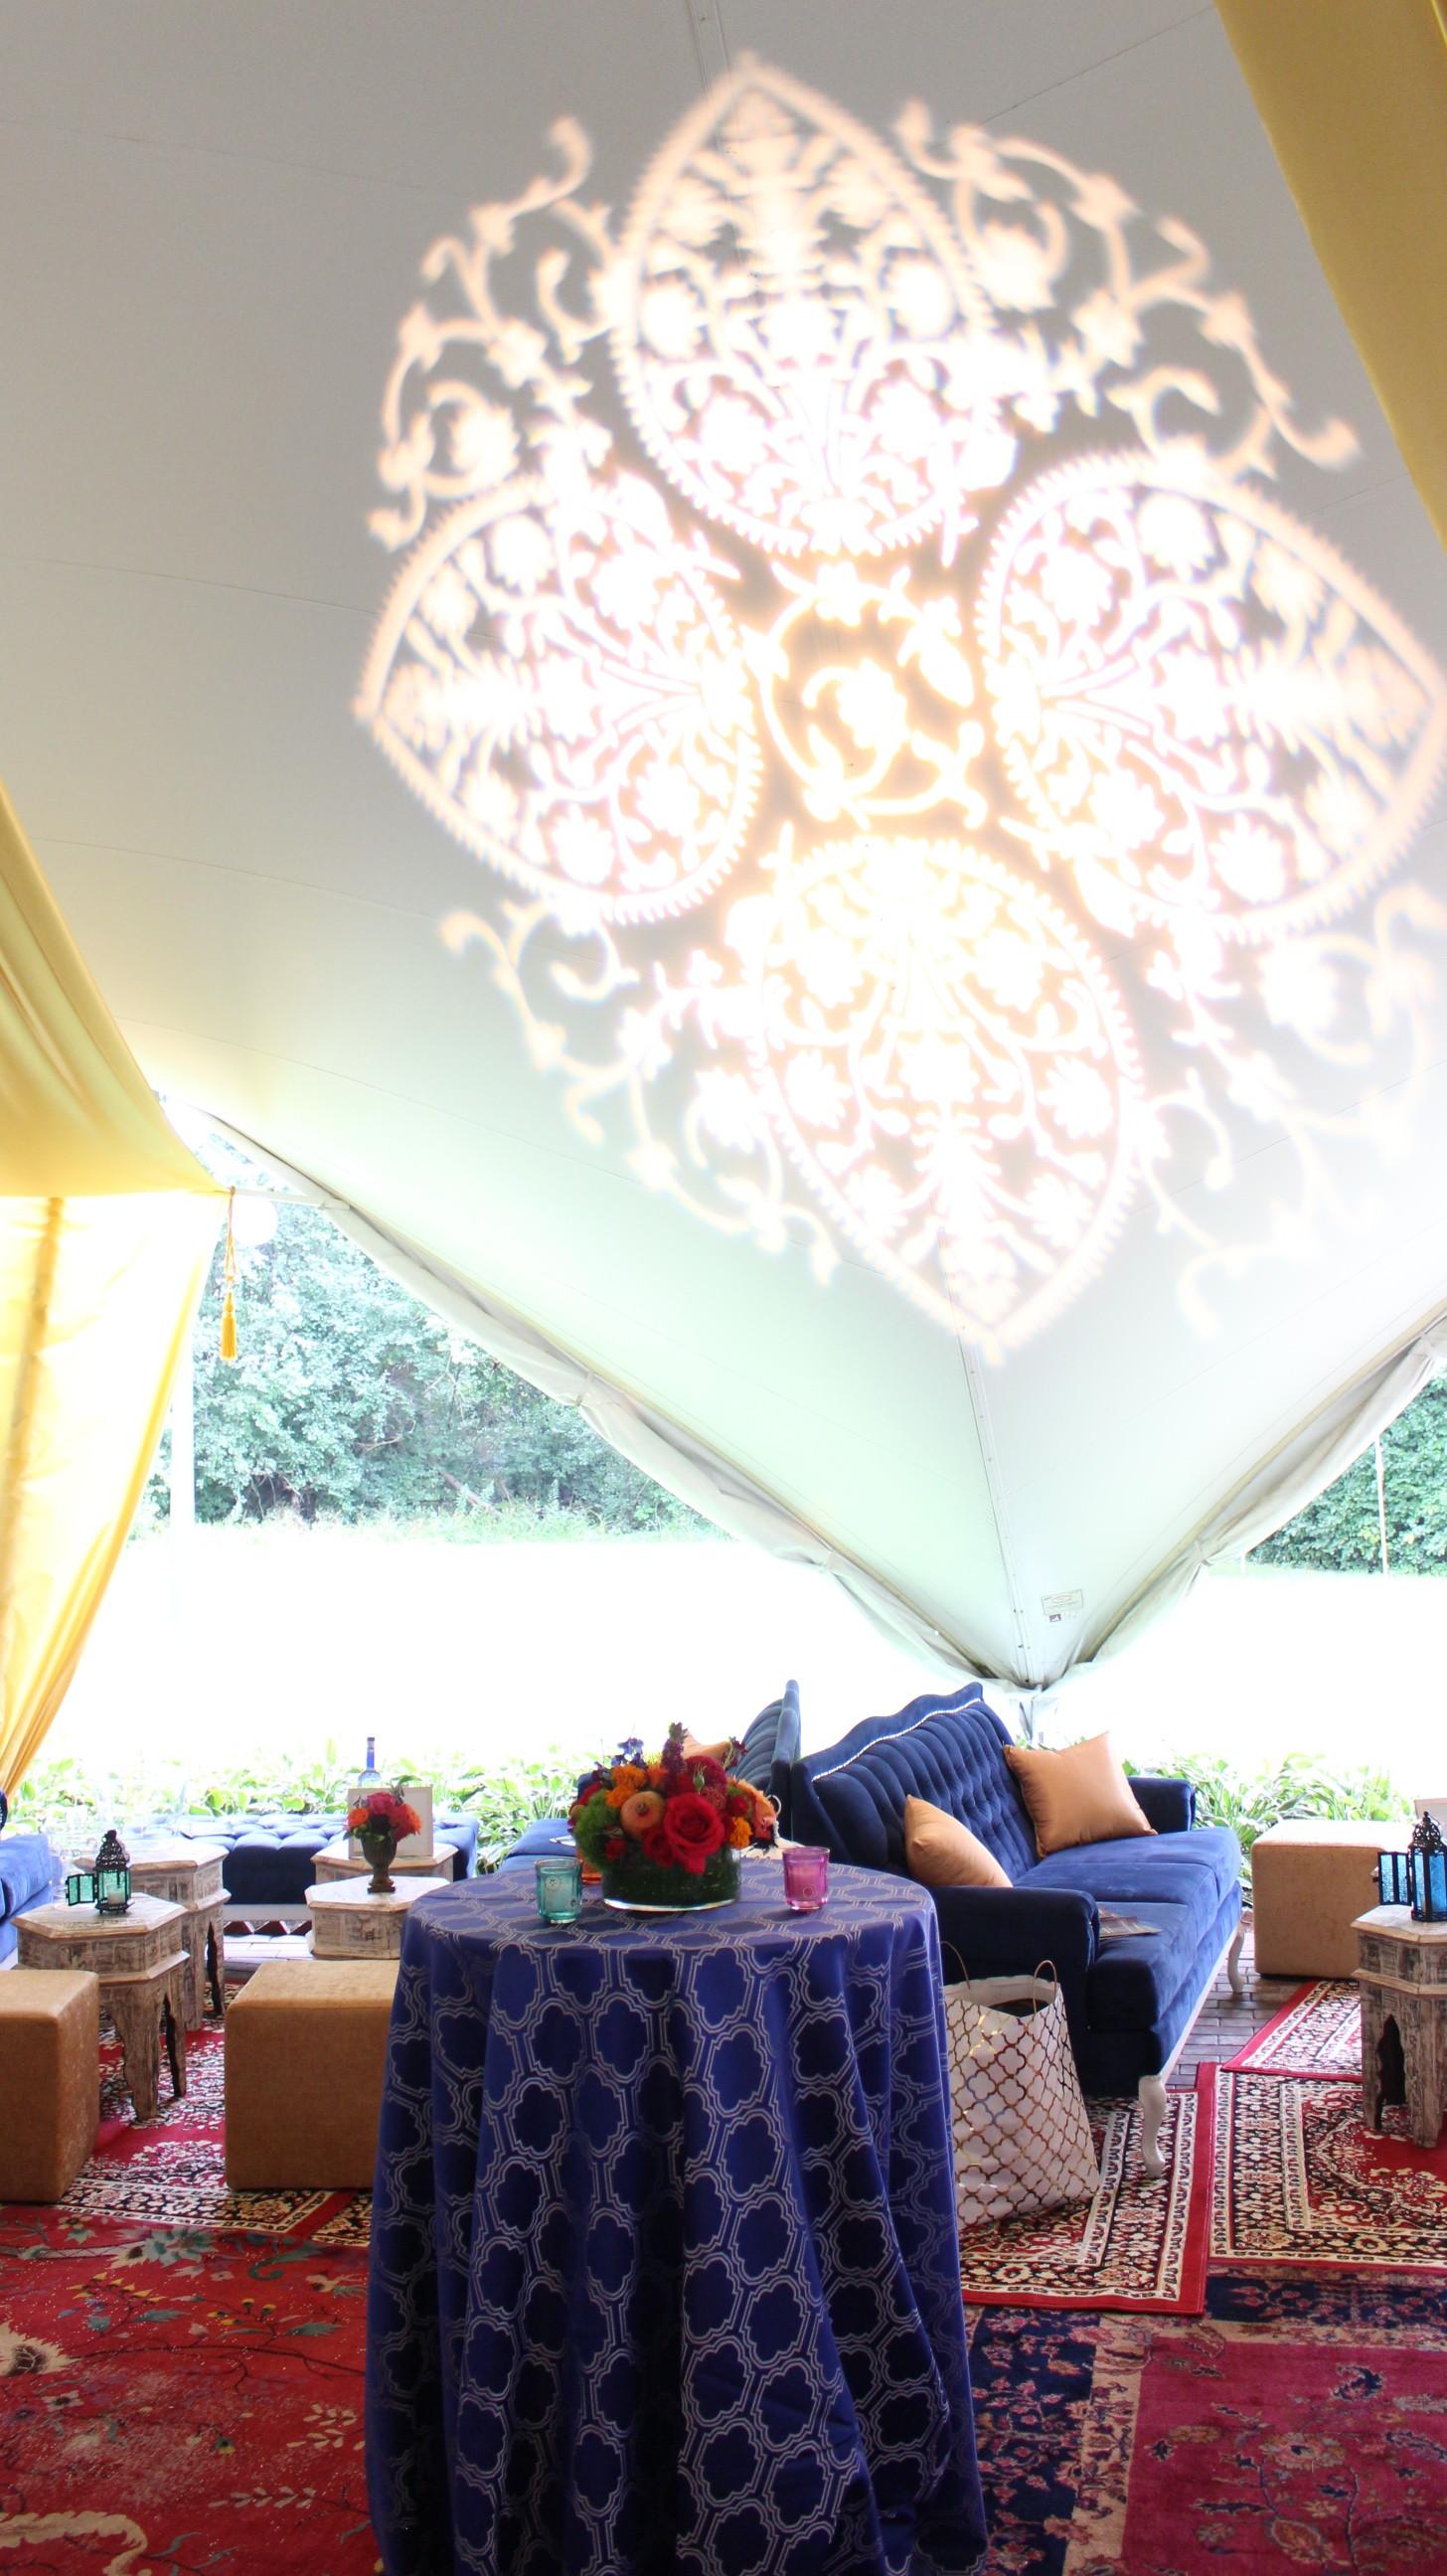 Lighting and Drape for a Moroccan Themed Wedding - MDM Entertainment